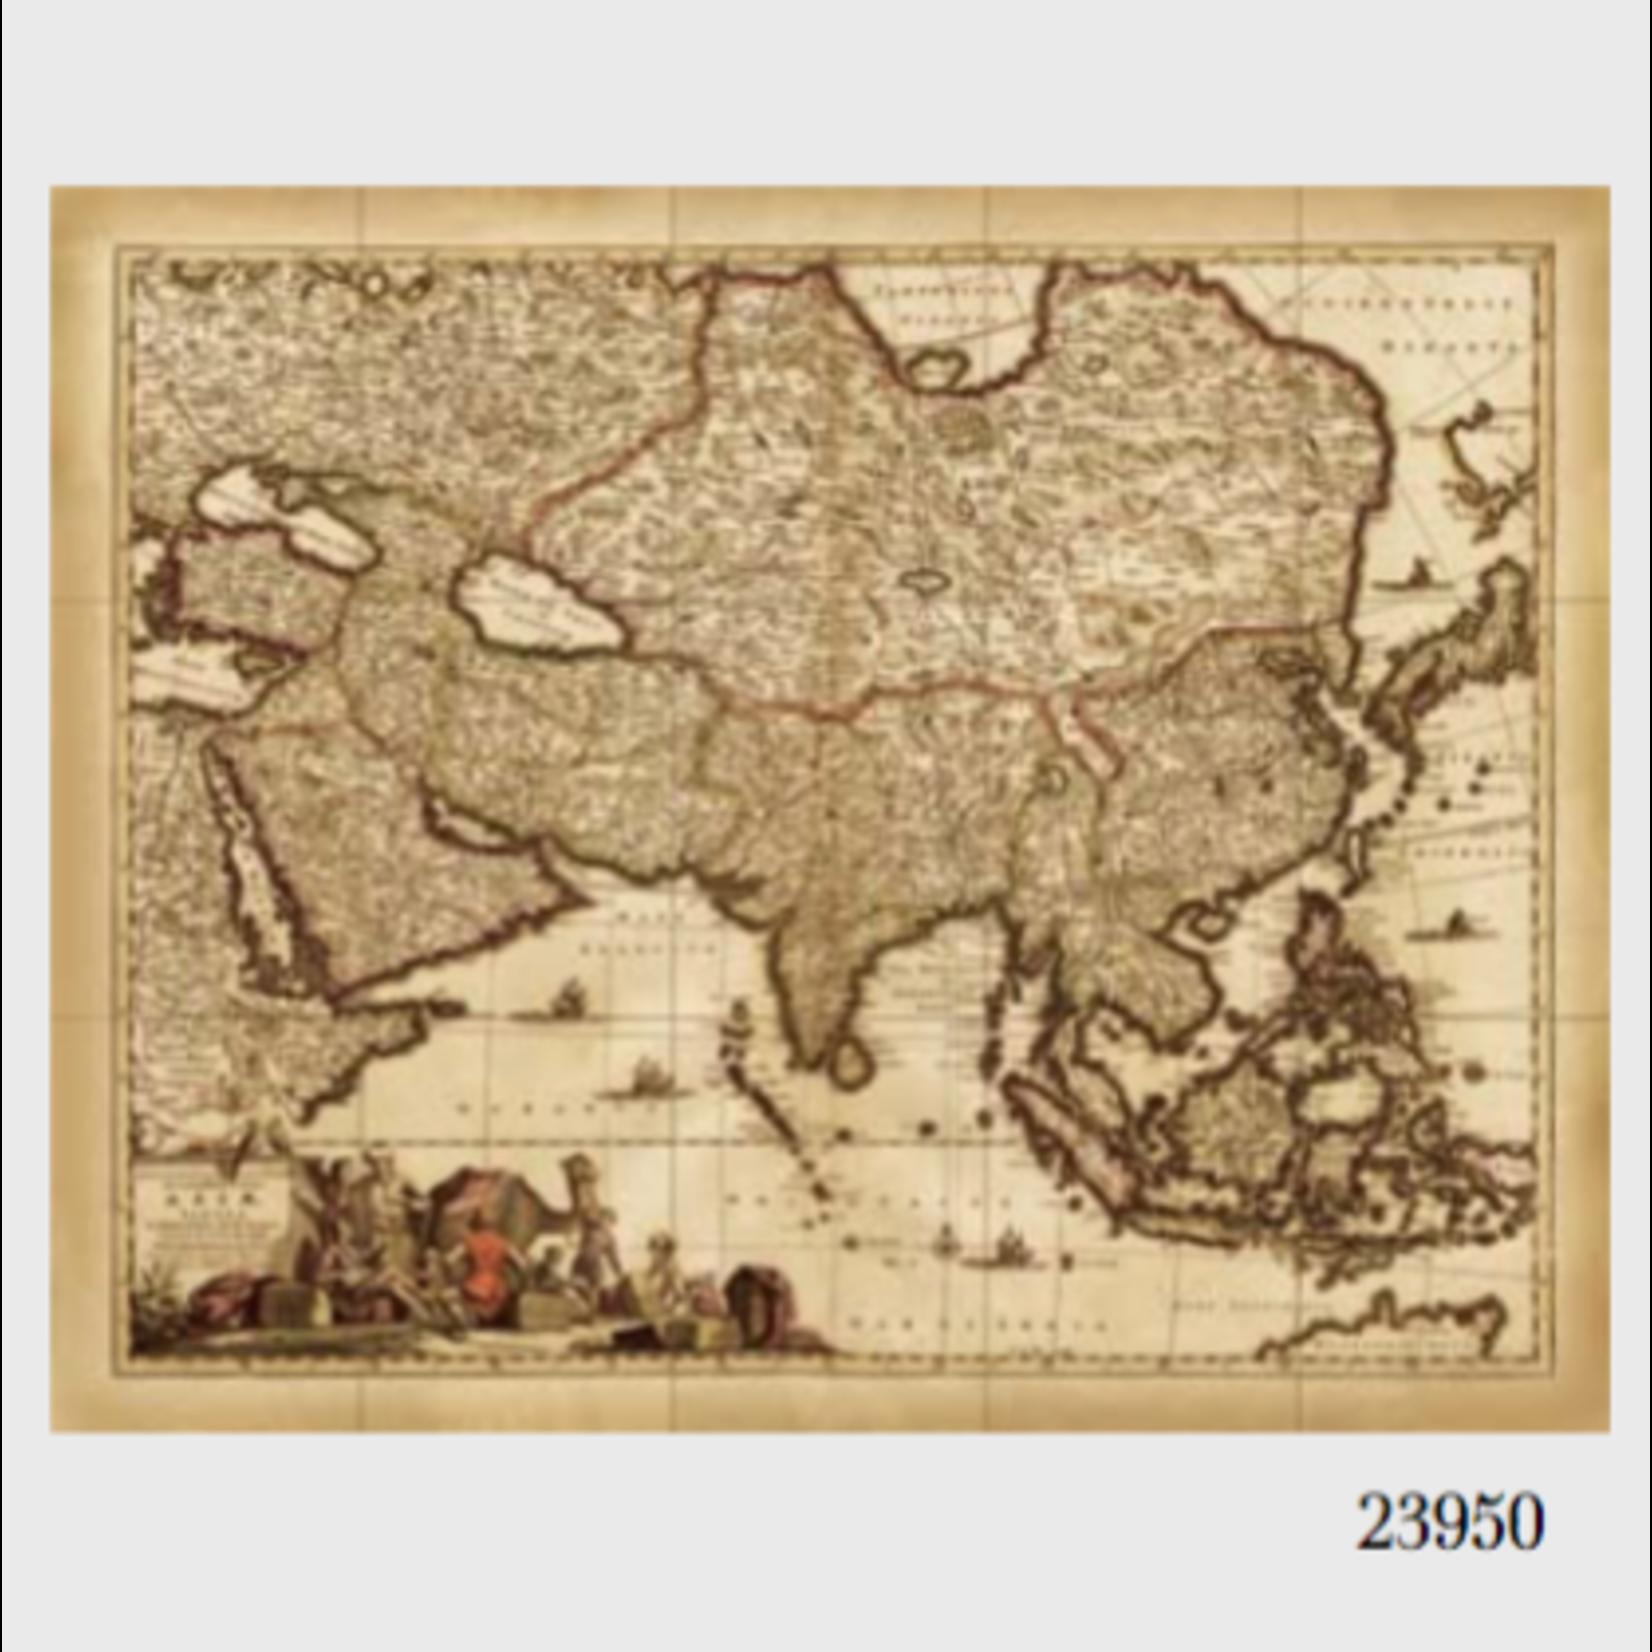 VAN THIEL MAP OF ASIA LARGE